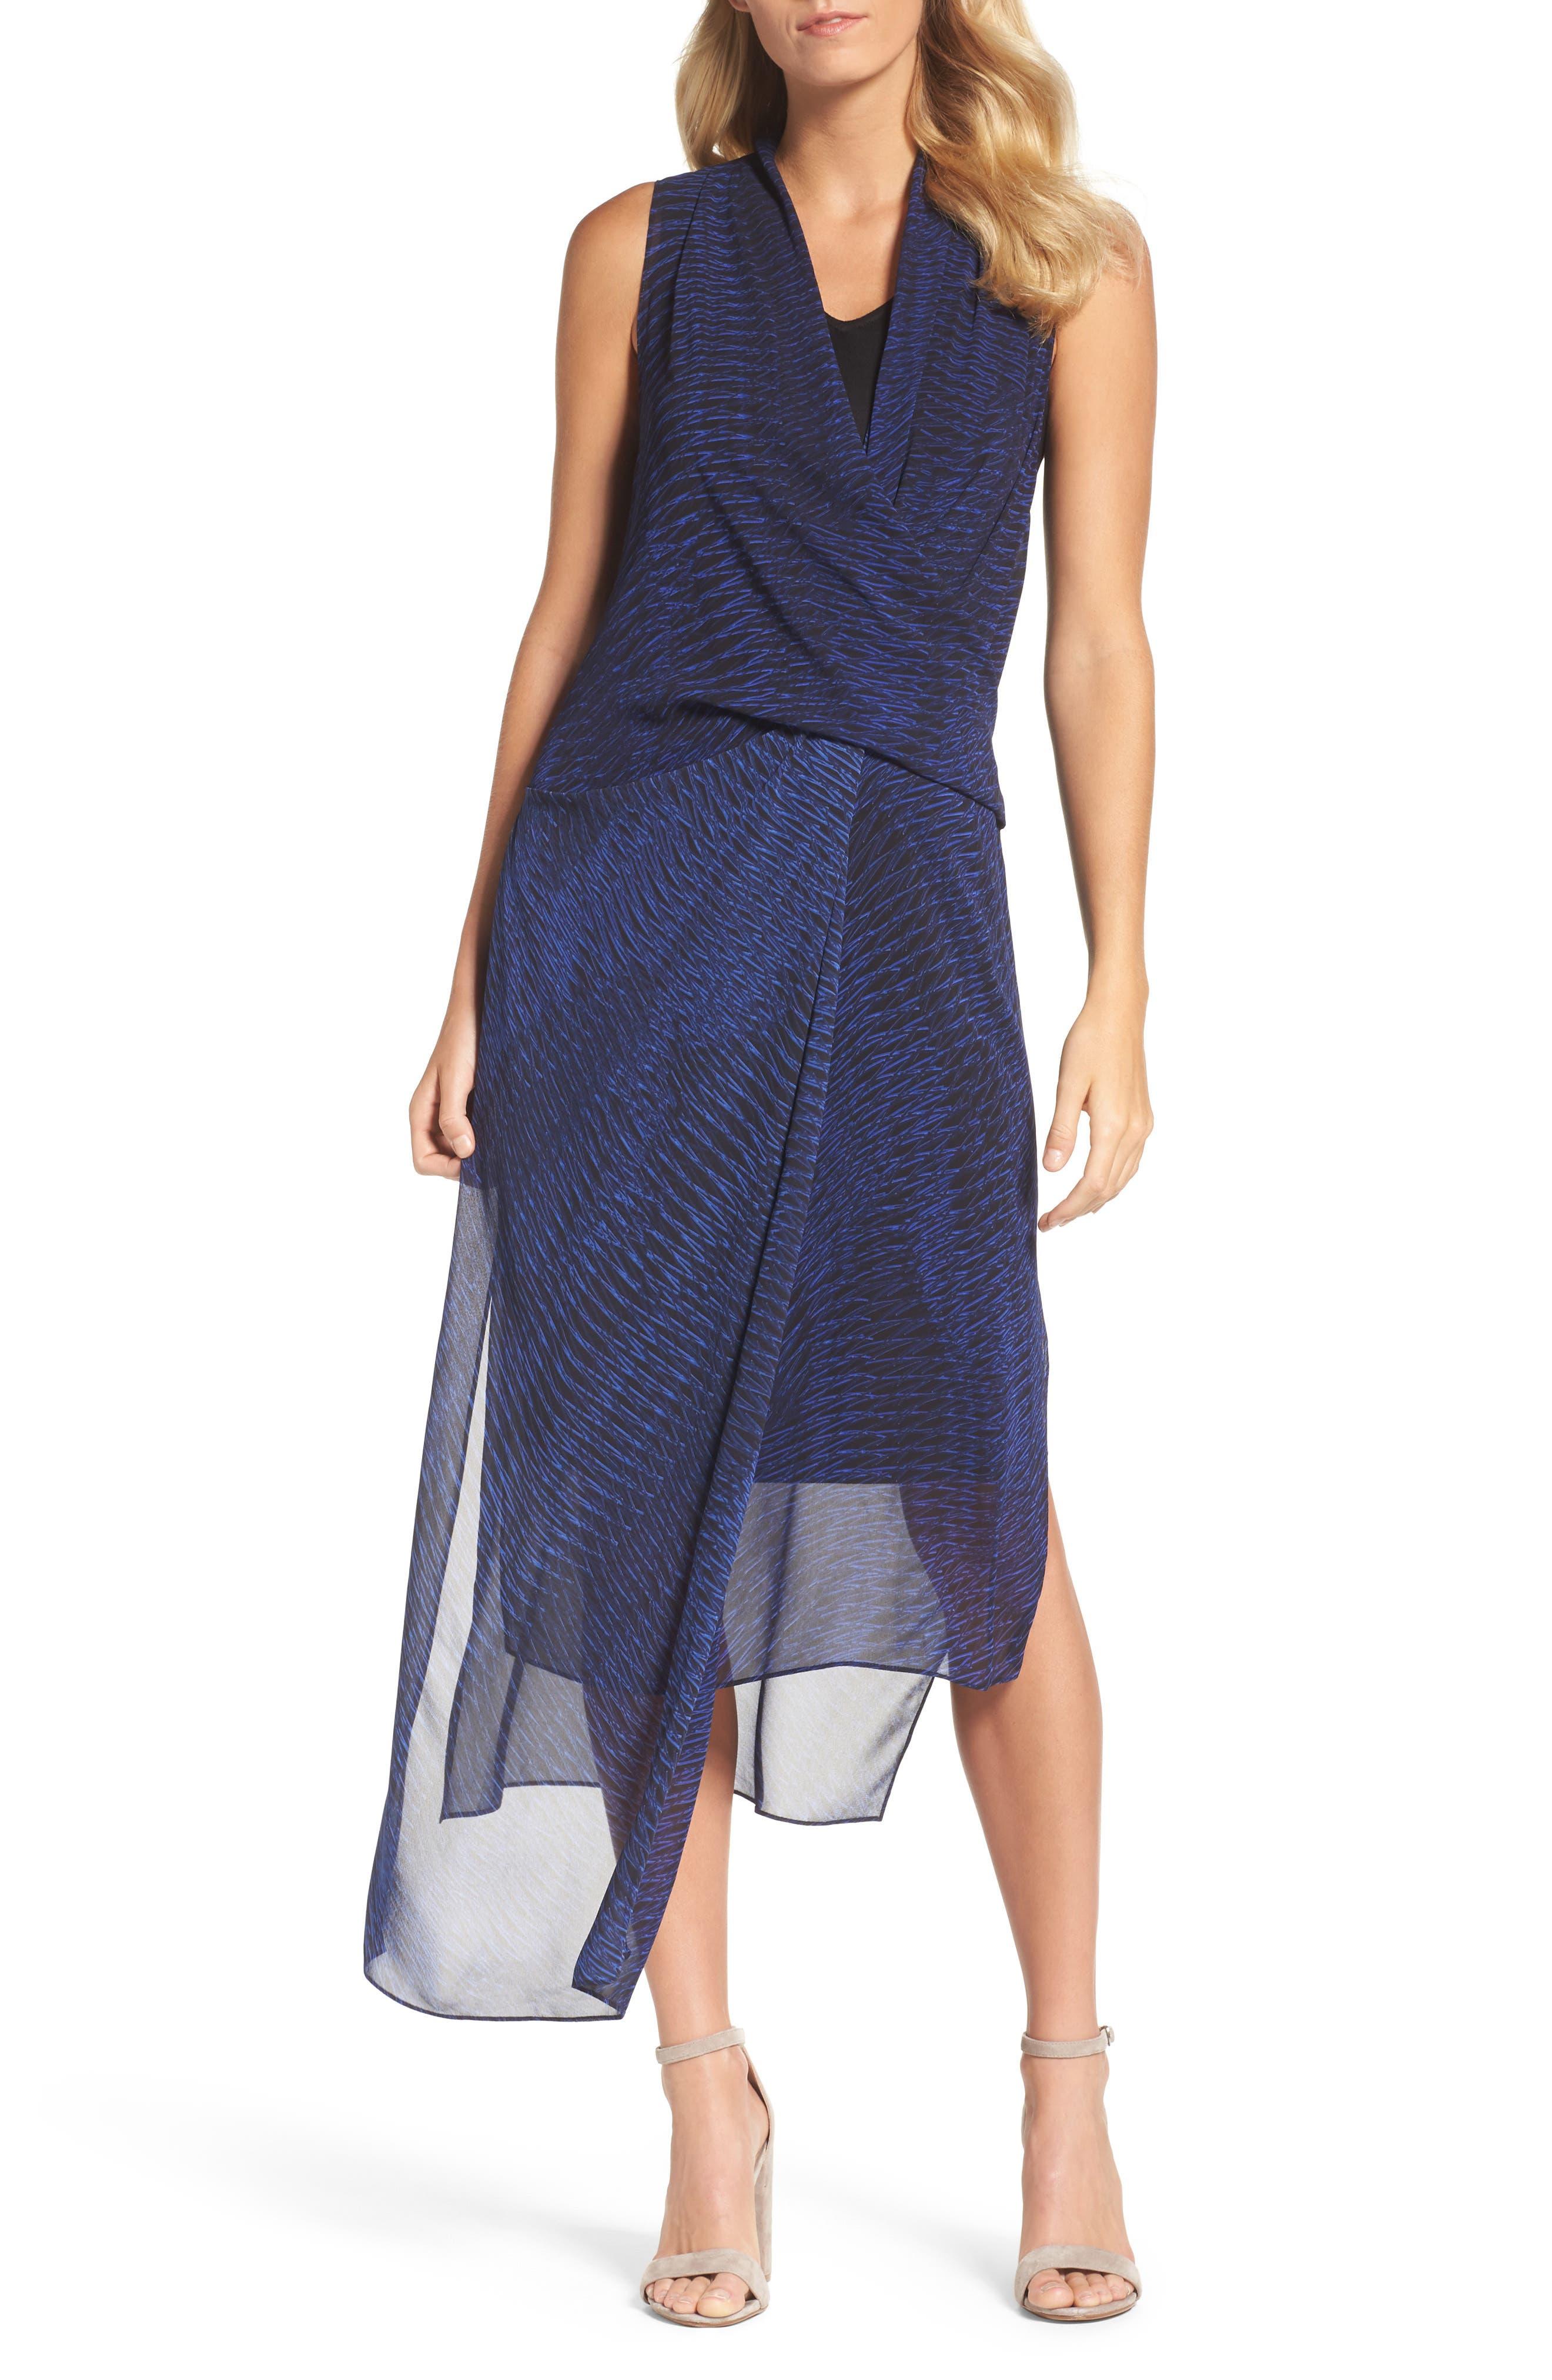 Blue Streaks Midi Dress,                         Main,                         color, Blue Roma